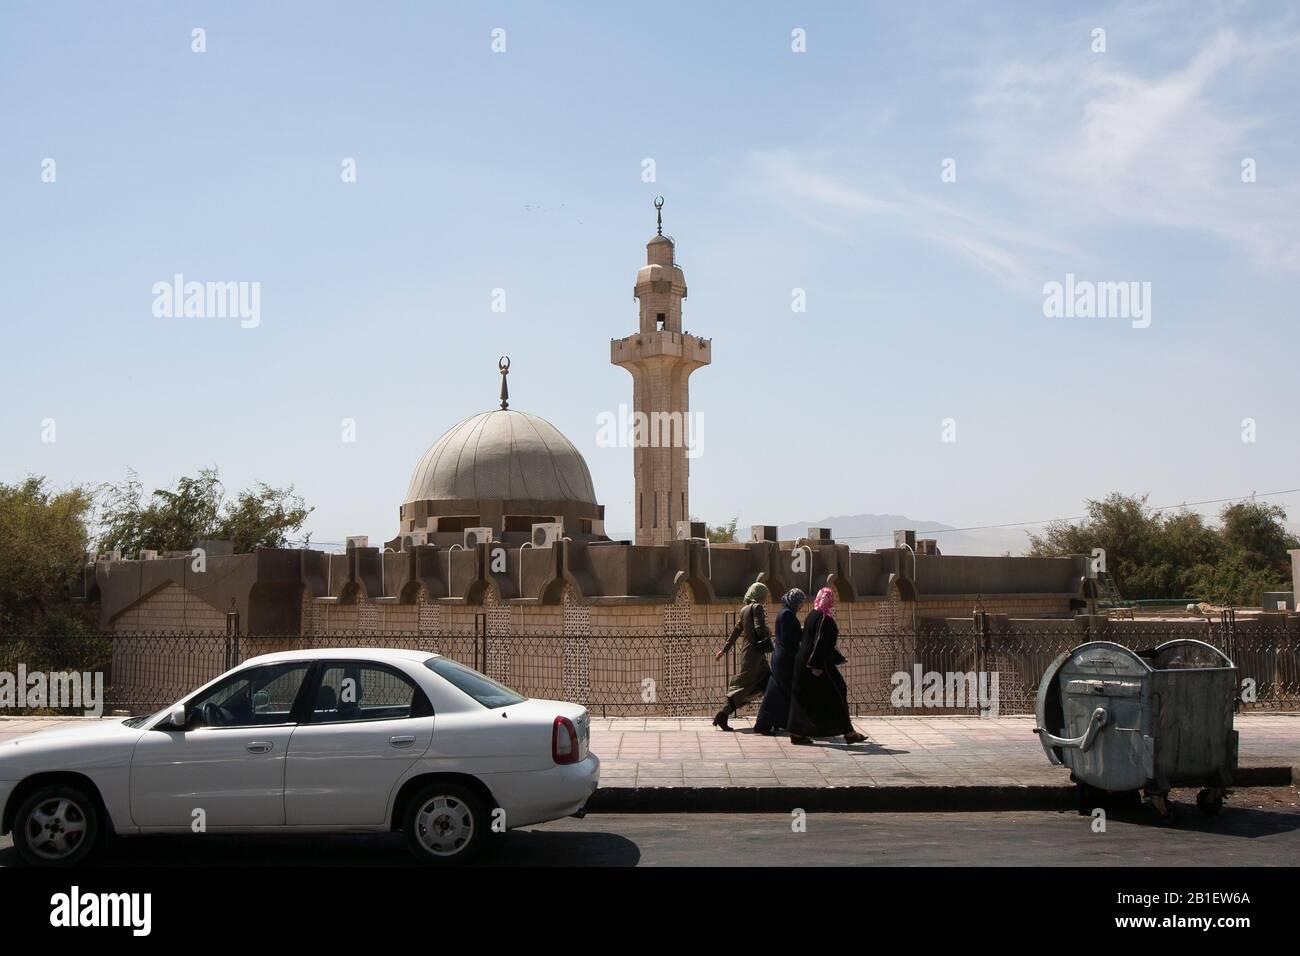 Aqaba, Jordan, April 27, 2009: Women walk on the sidewalk of a road, passing a mosque in Aqaba, Jordan. Stock Photo